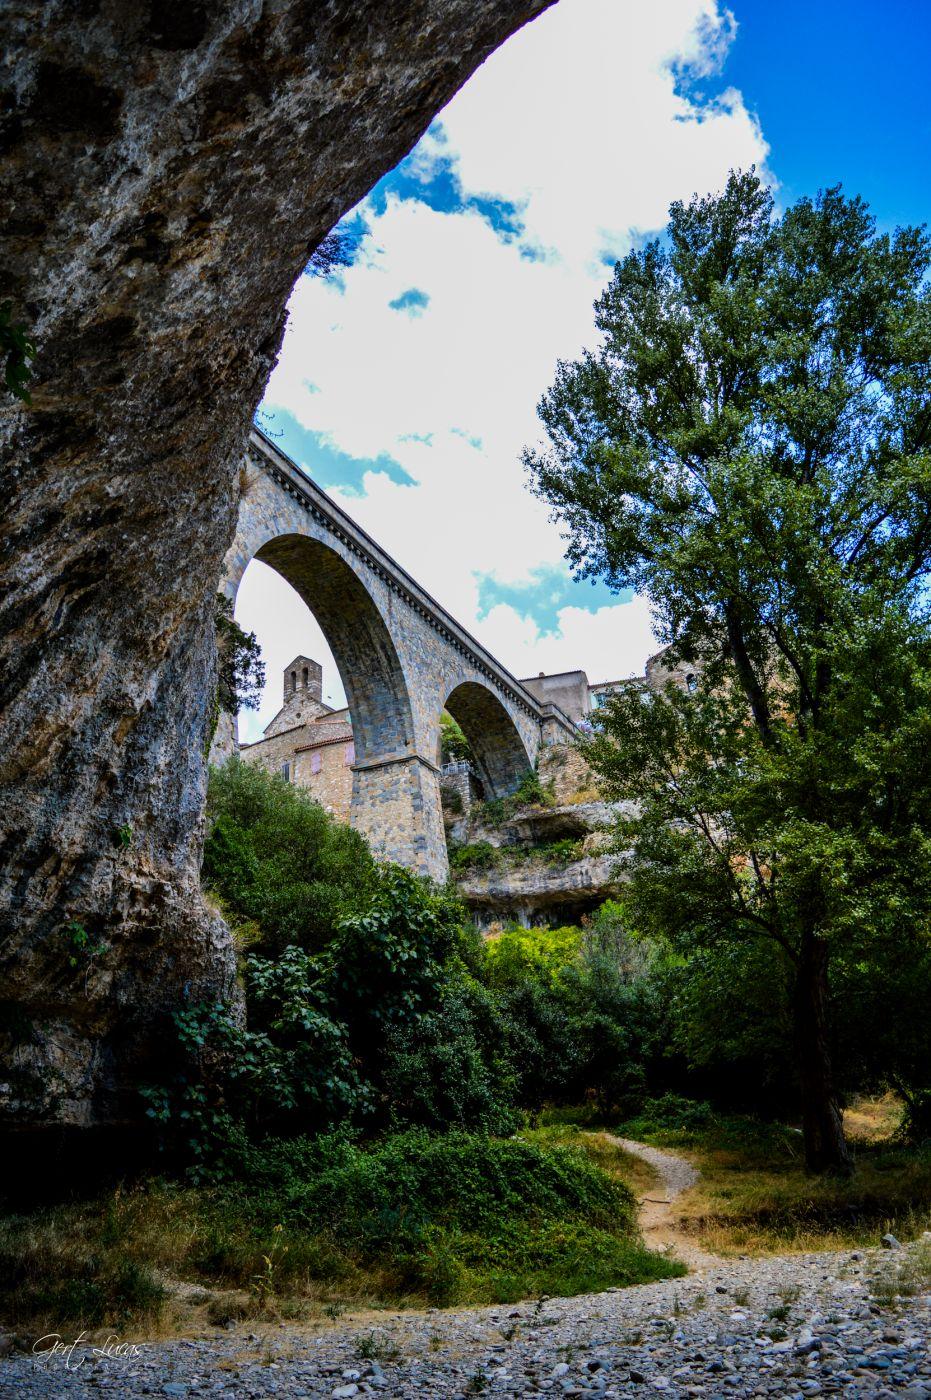 Minerve - The Cave entrance, France